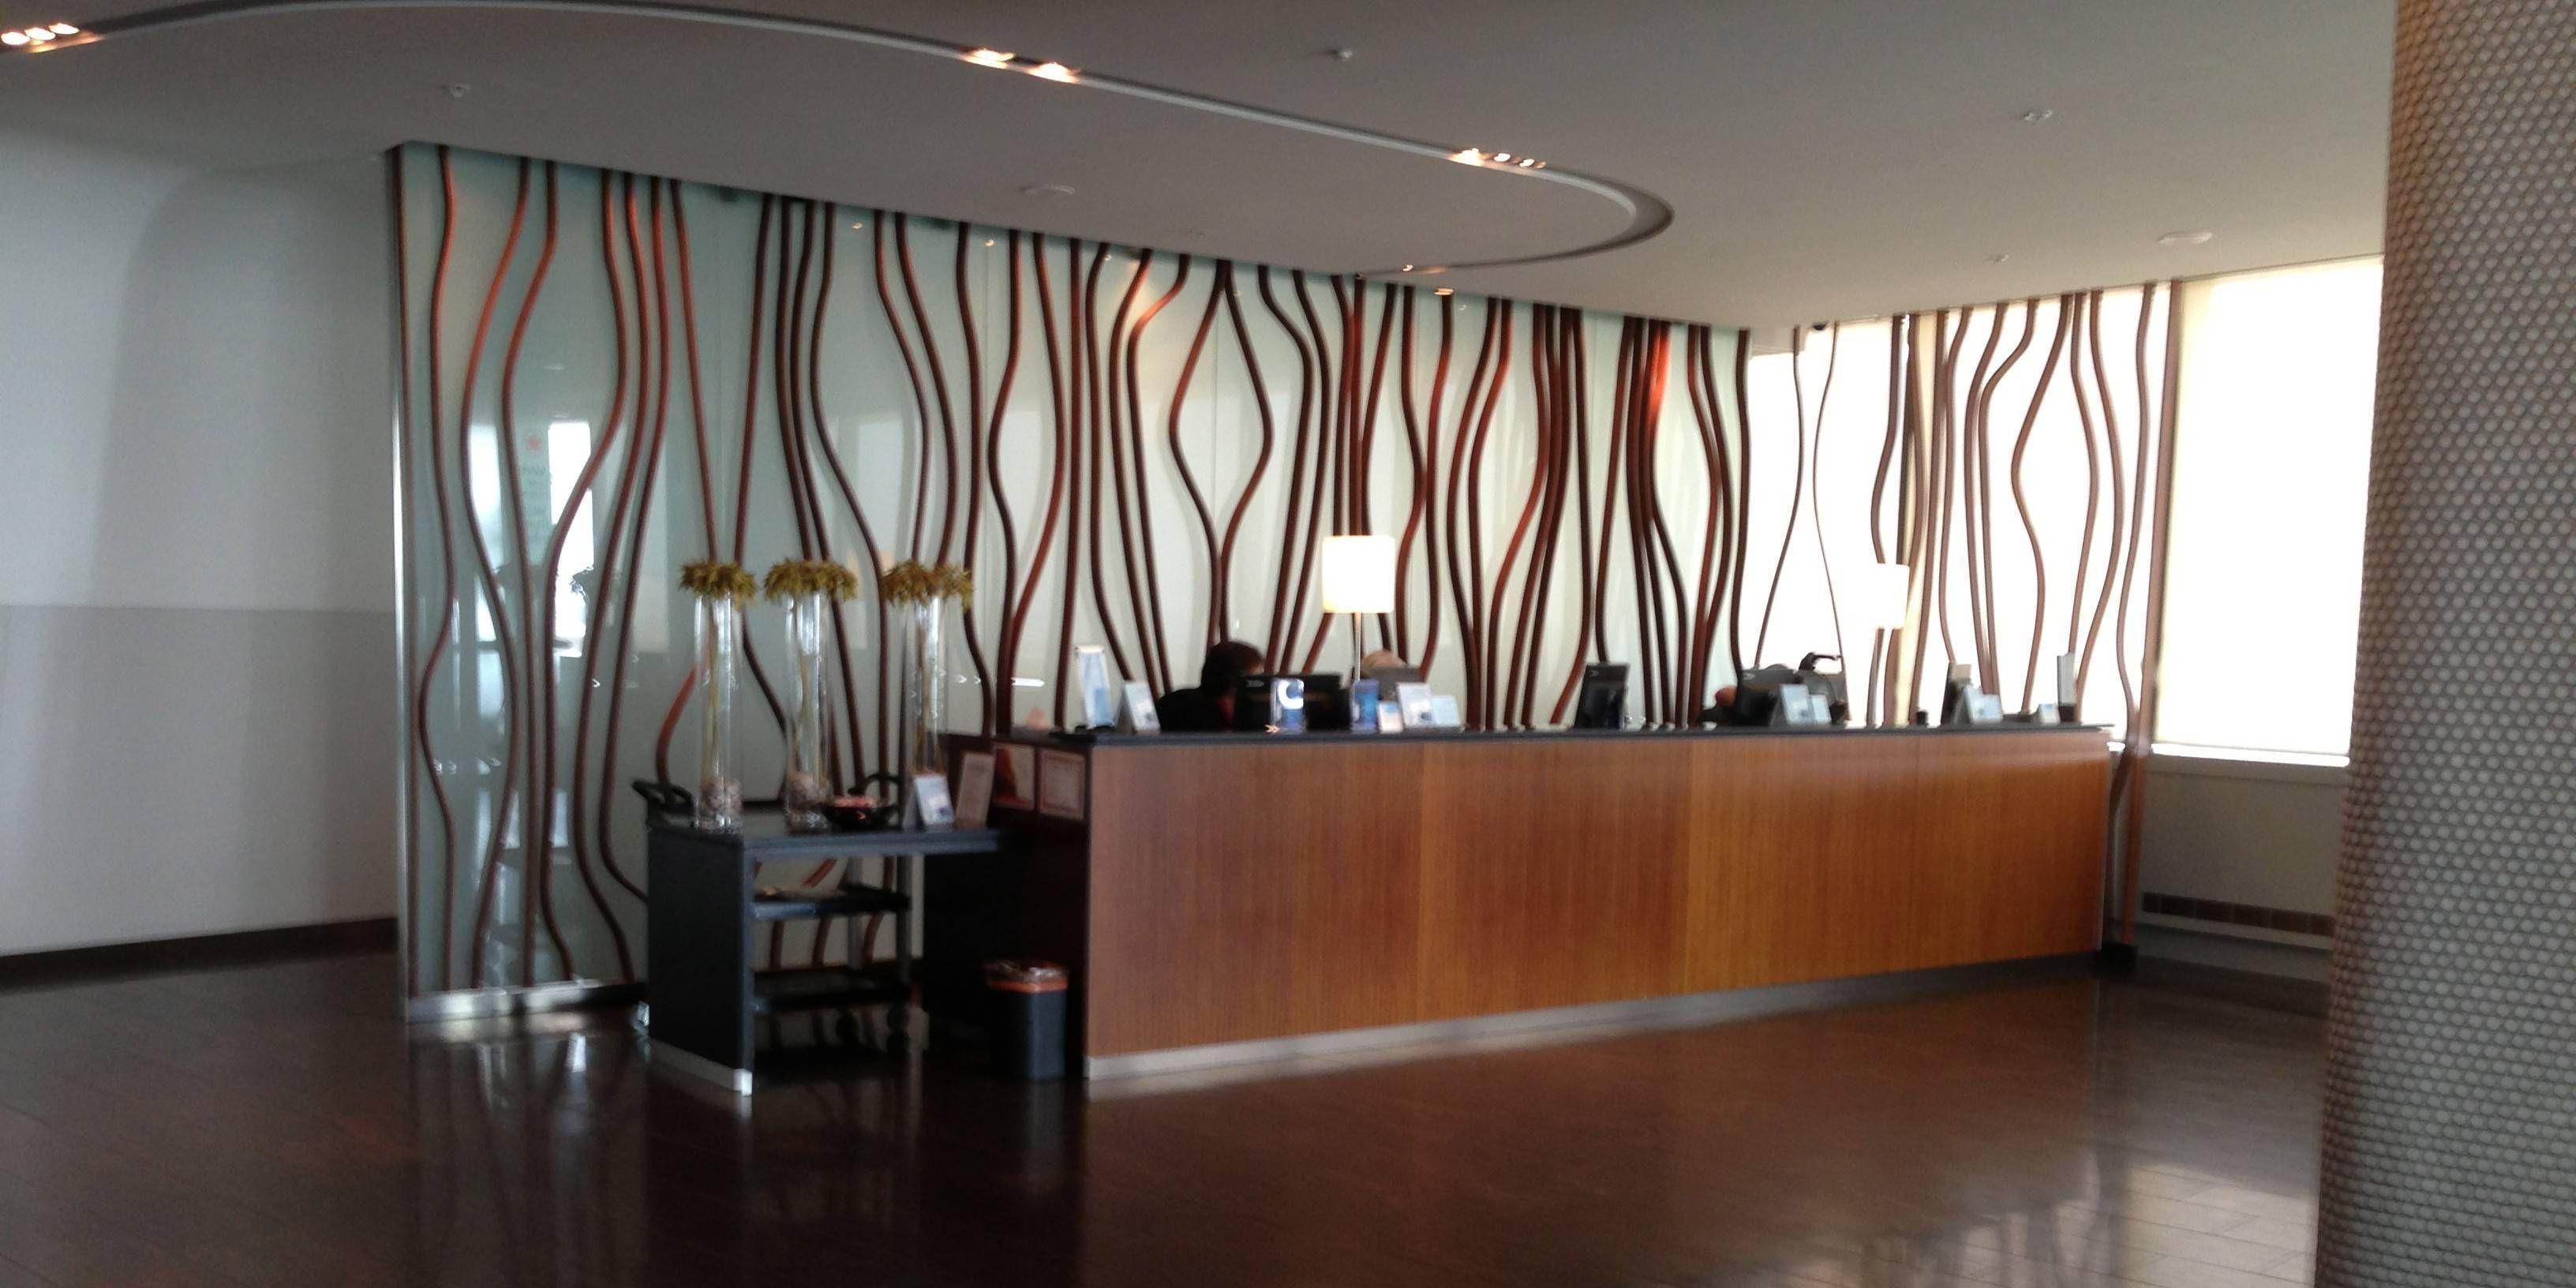 Sala VIP Maple Leaf Lounge da Air Canada no Aeroporto de Toronto